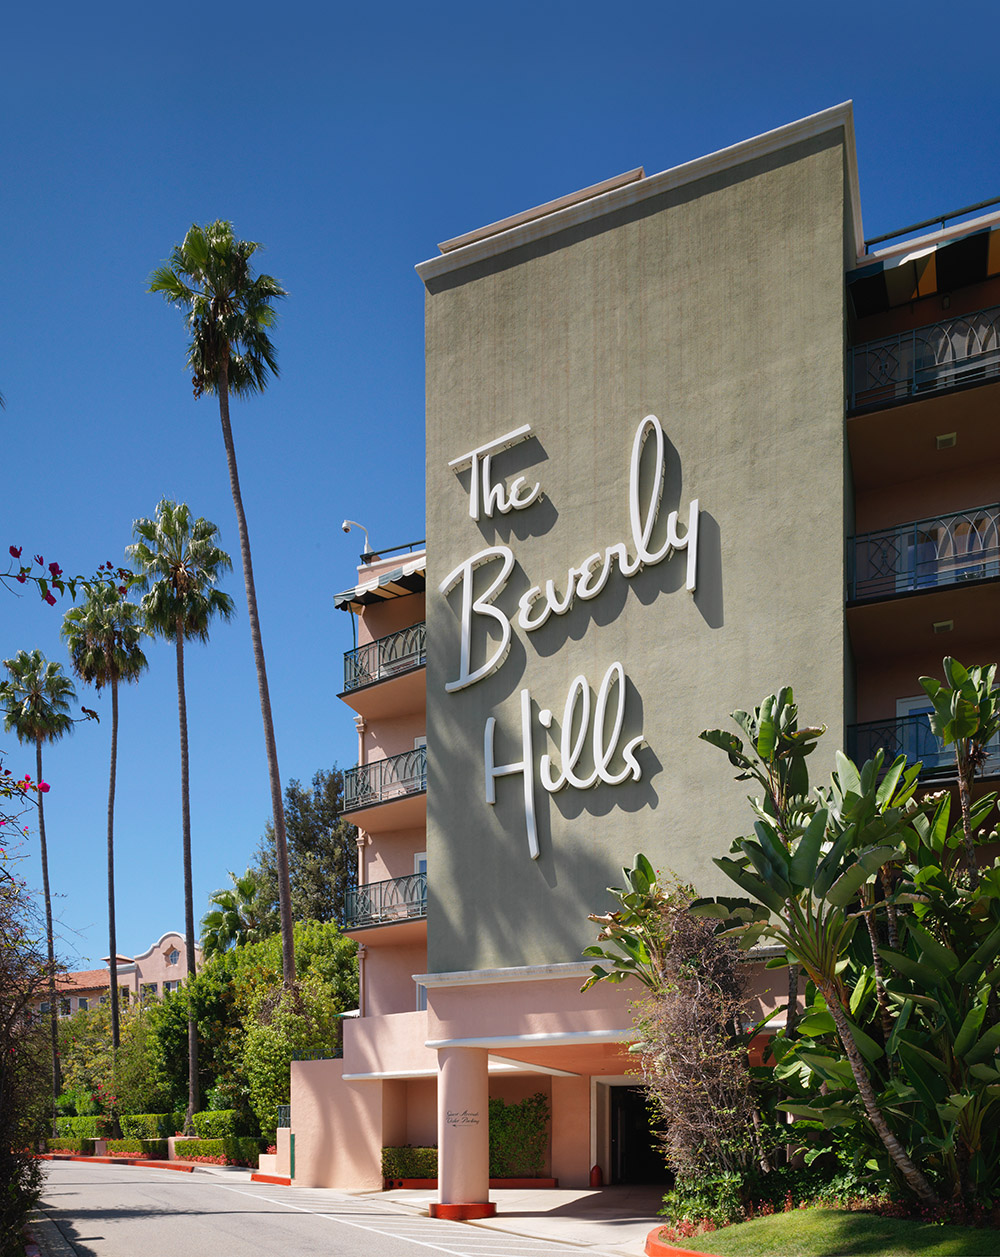 resized beverly hills hotel.jpg